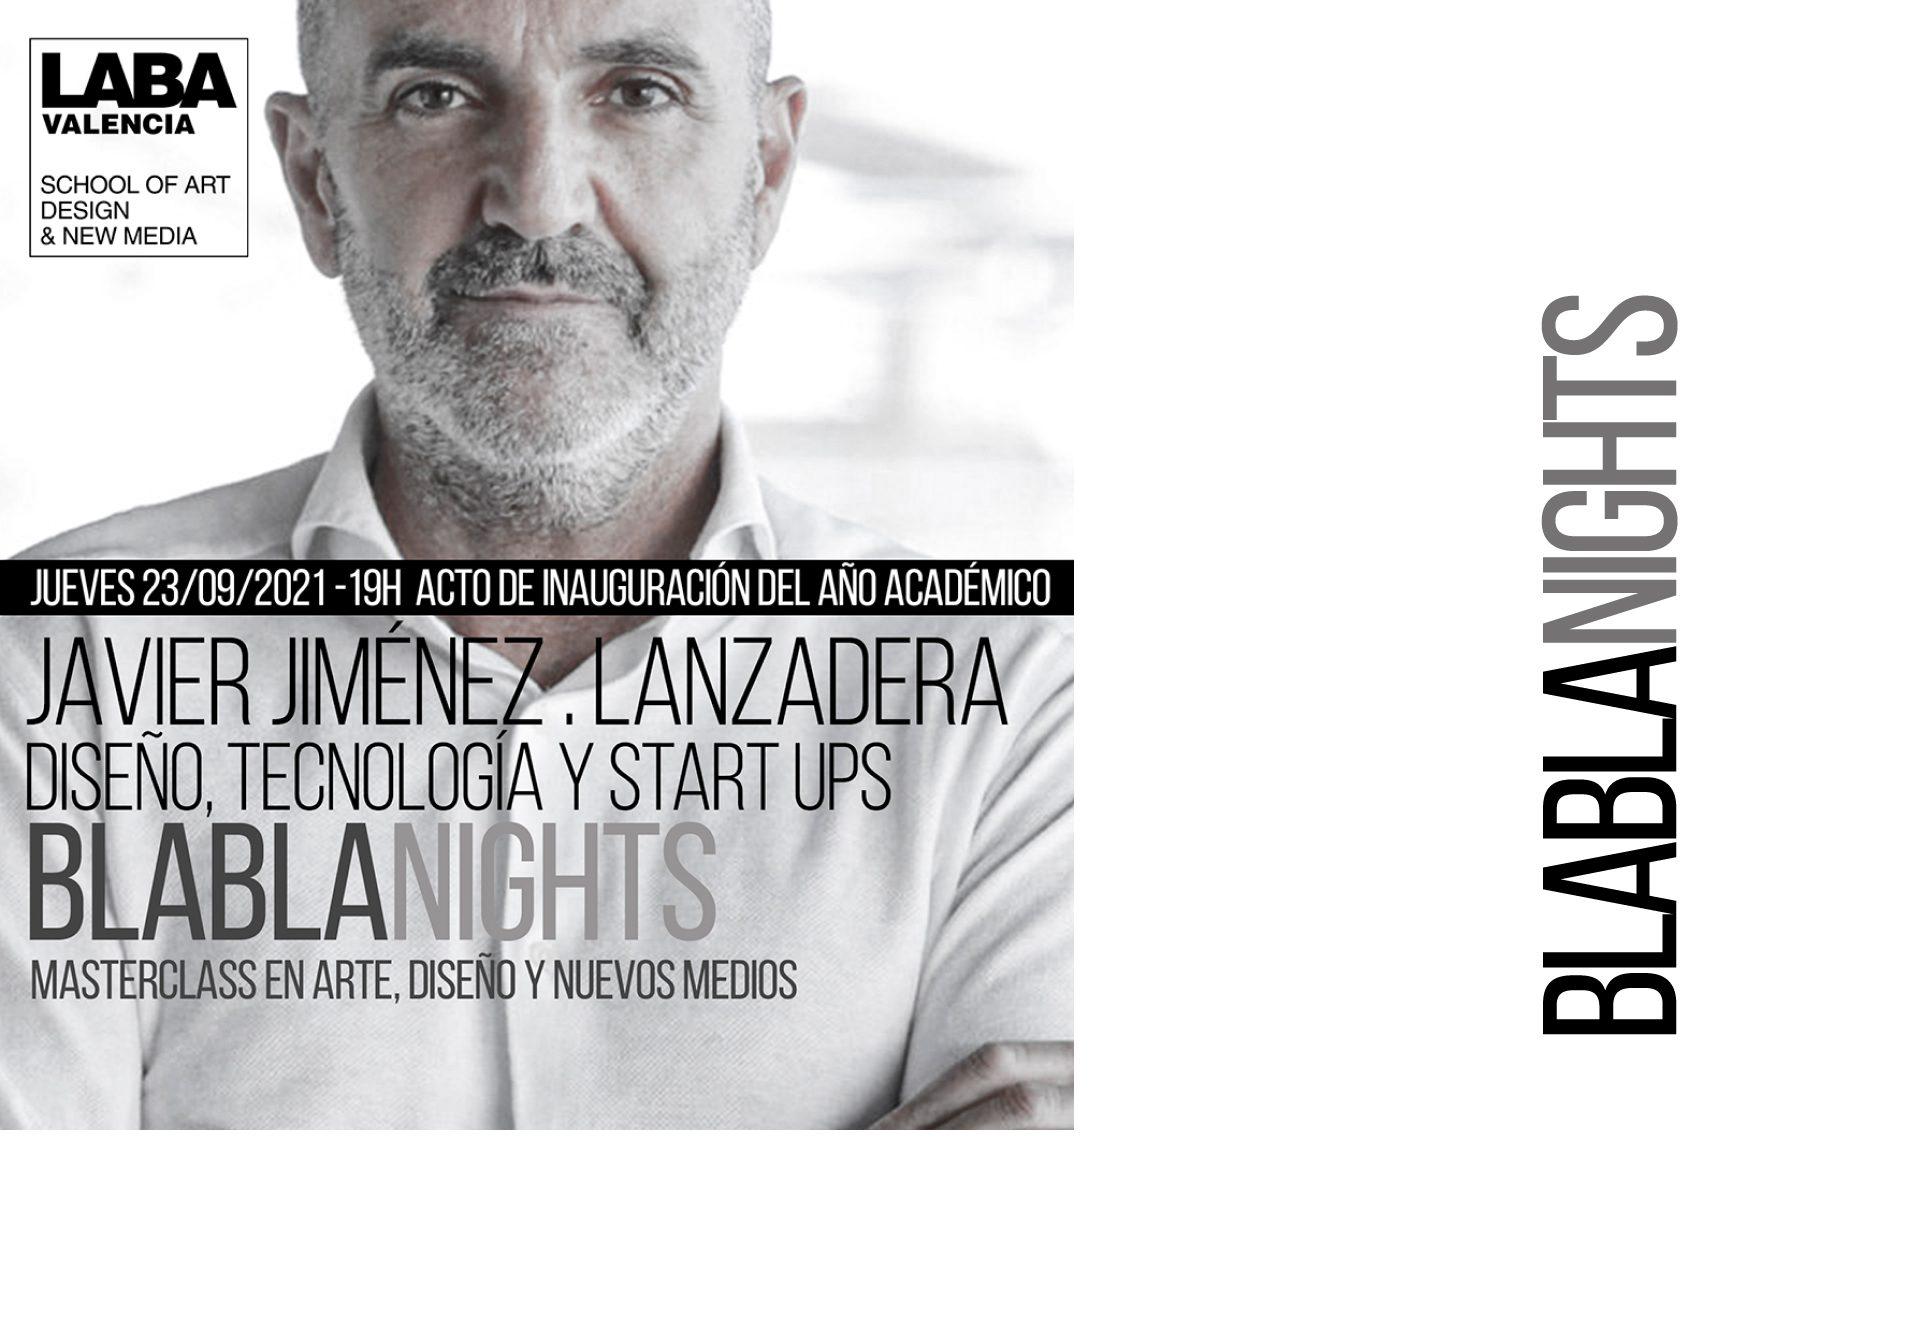 MASTERCLASS. BlaBlaNights con Javier Jiménez (Lanzadera)